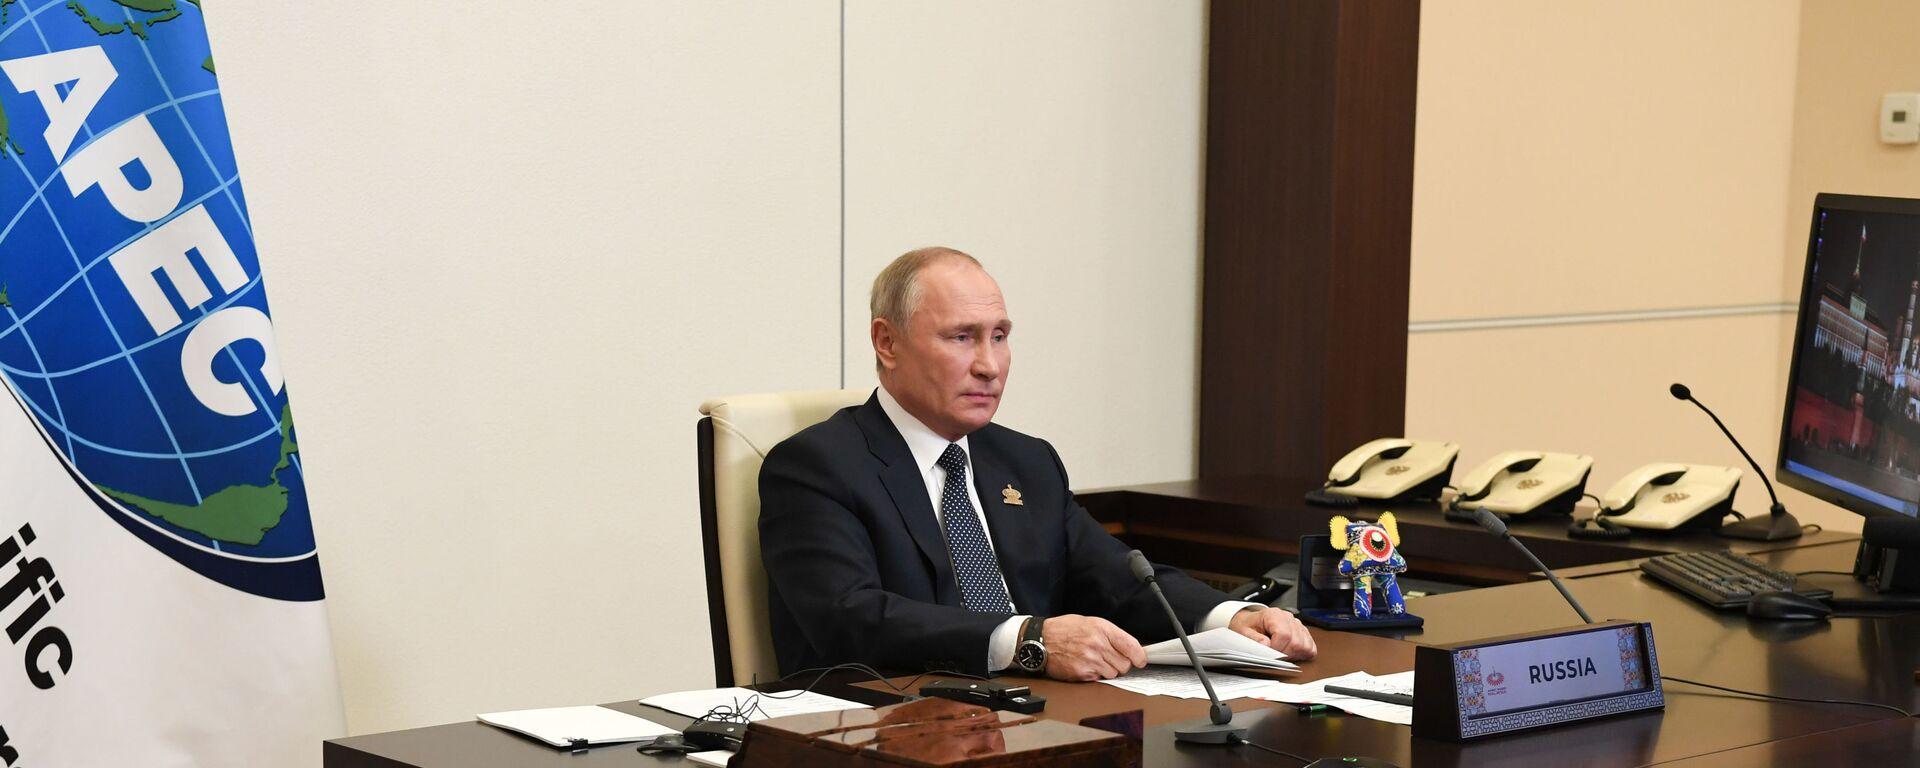 El presidente de Rusia, Vladímir Putin, y el 'monstruo' de Malasia - Sputnik Mundo, 1920, 16.07.2021